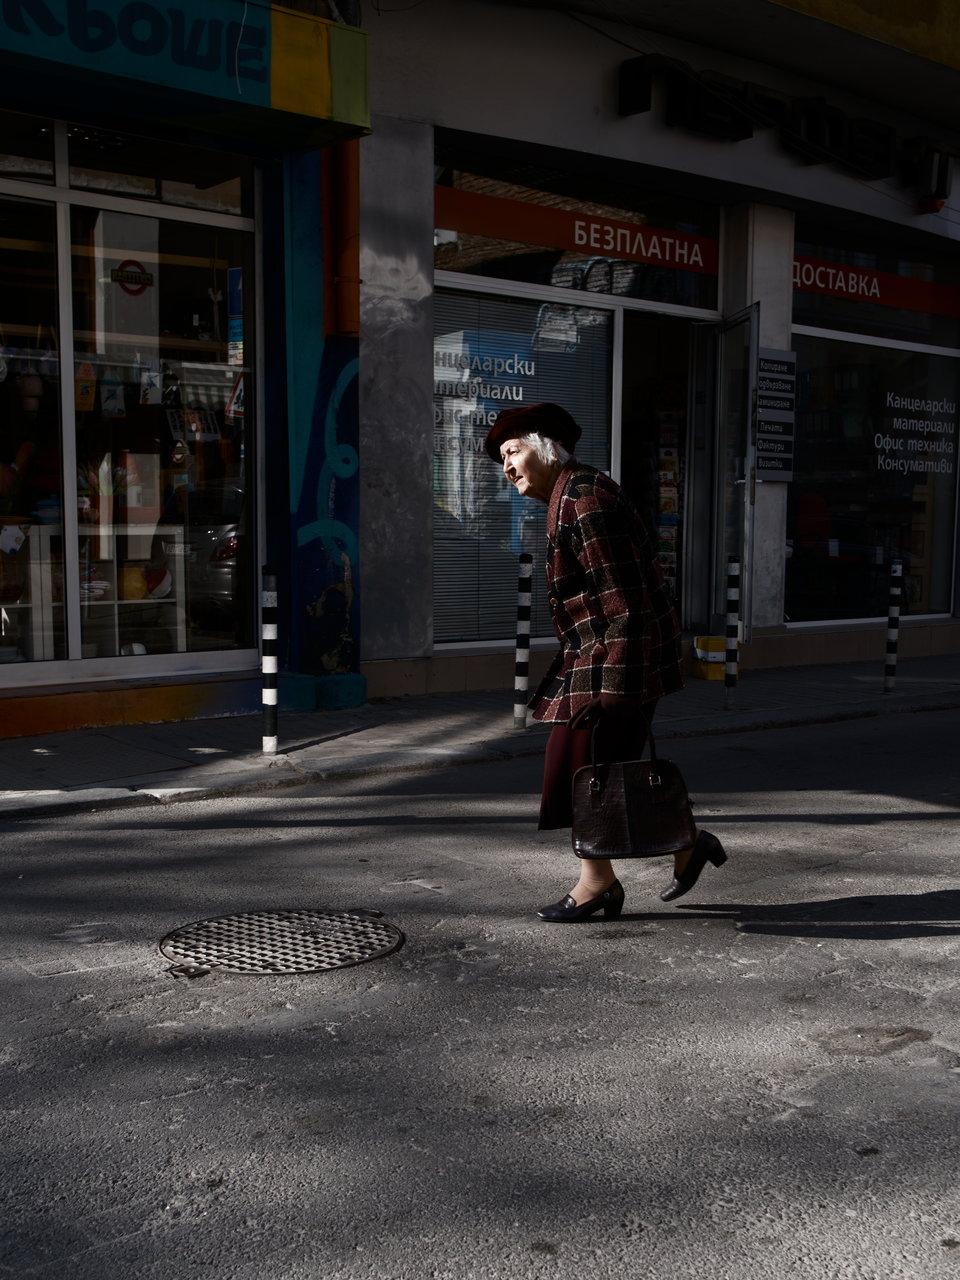 Photo in Everything else   Author Veska Saeva - veskas   PHOTO FORUM